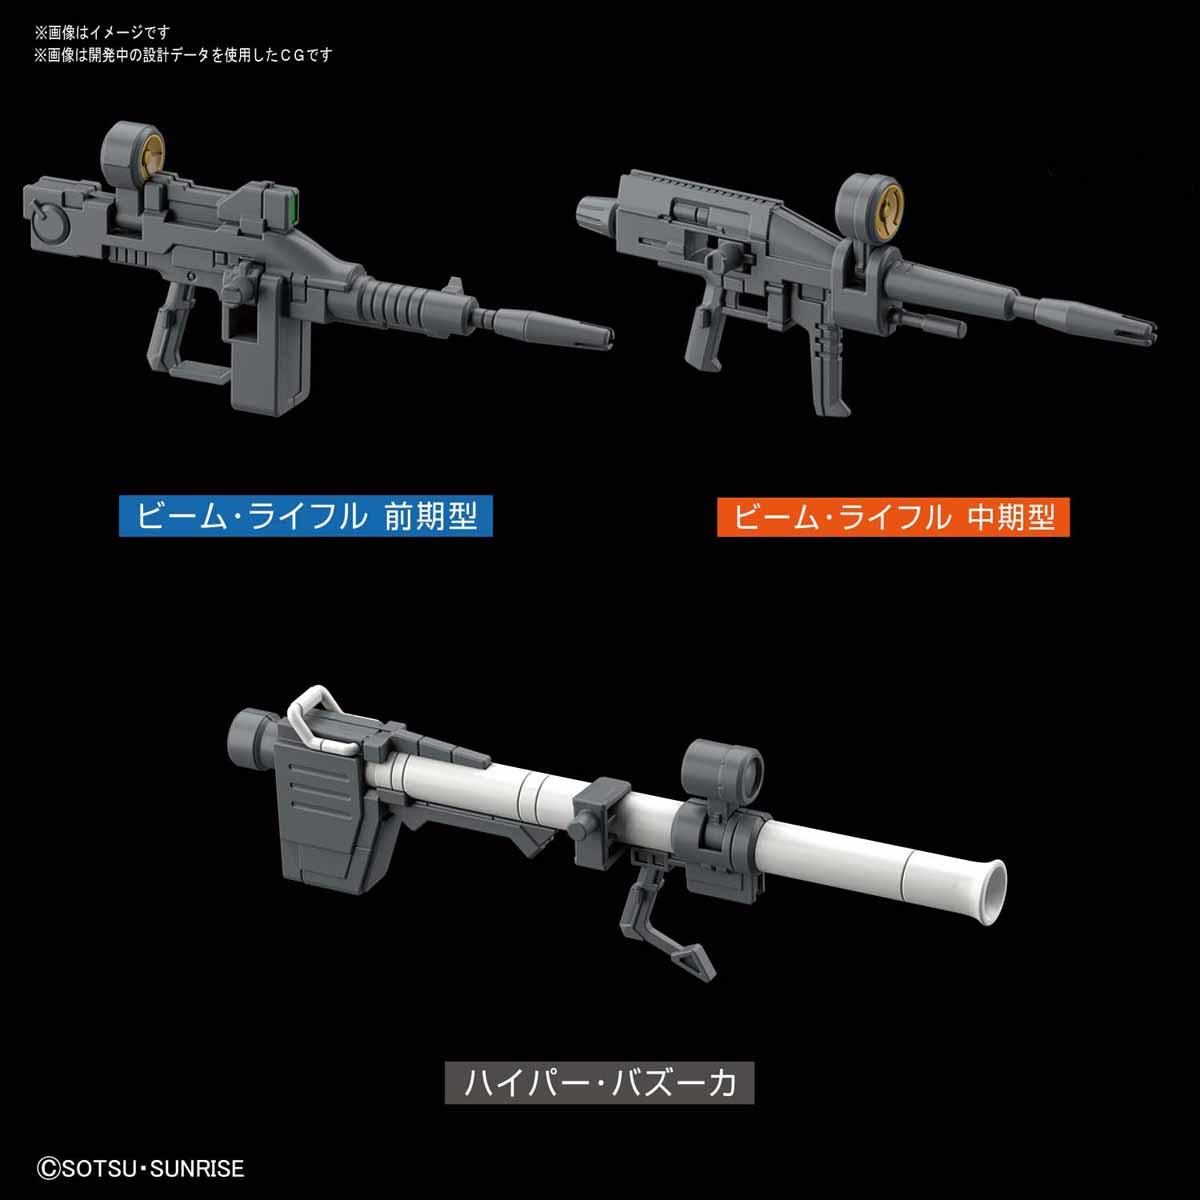 HG 1/144『RX-78-02 ガンダム(GUNDAM THE ORIGIN版)』プラモデル-007